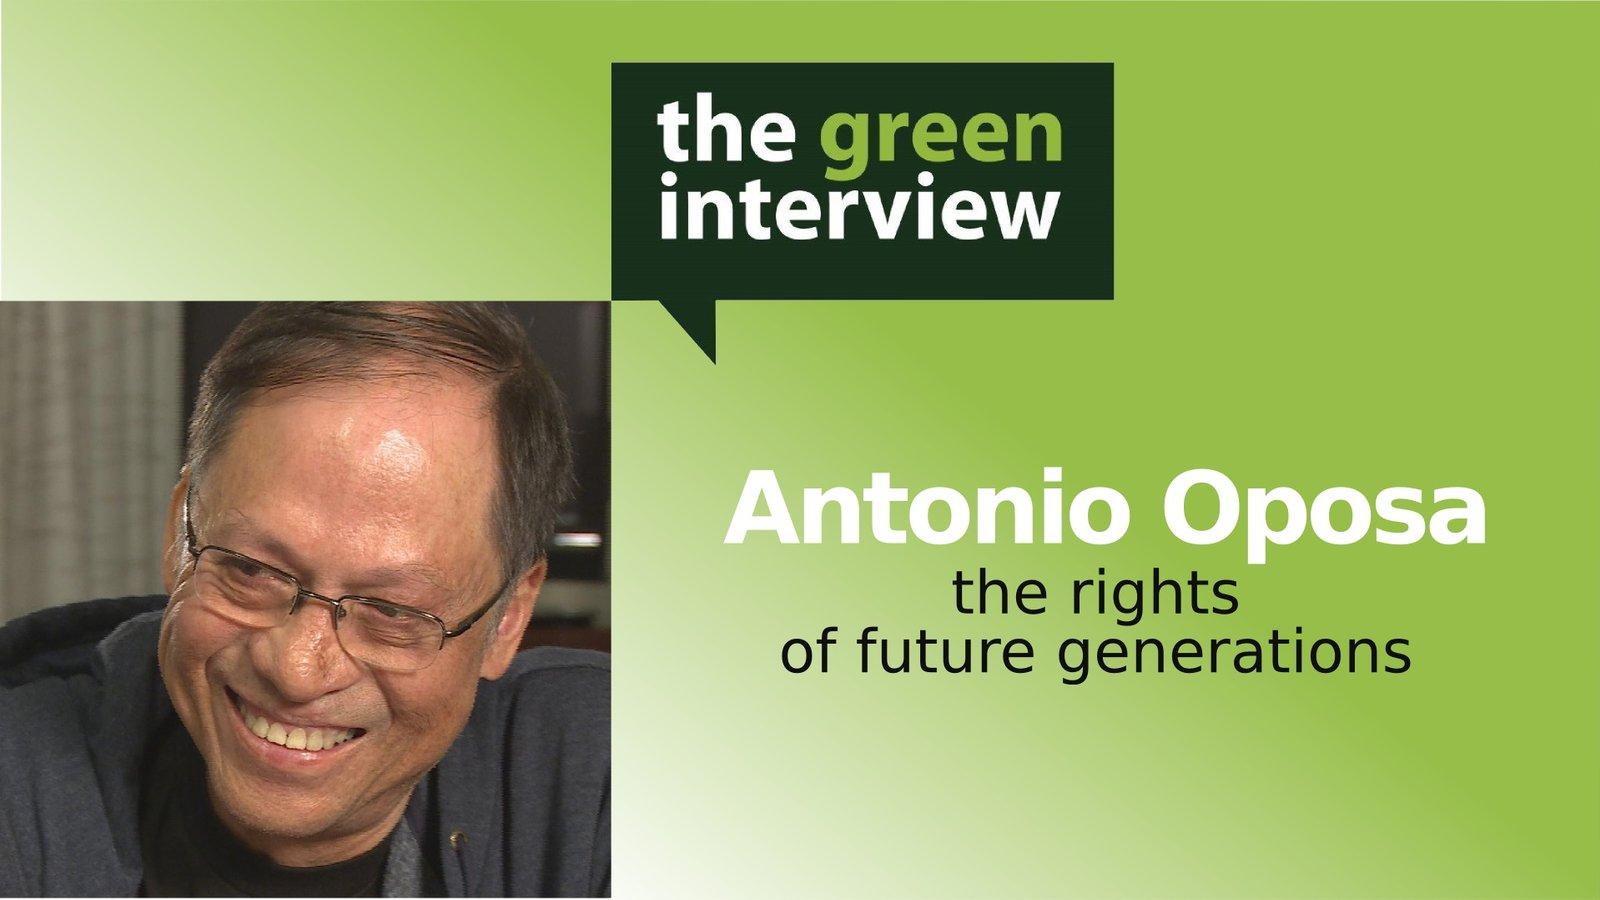 Antonio Oposa: The Rights of Future Generations